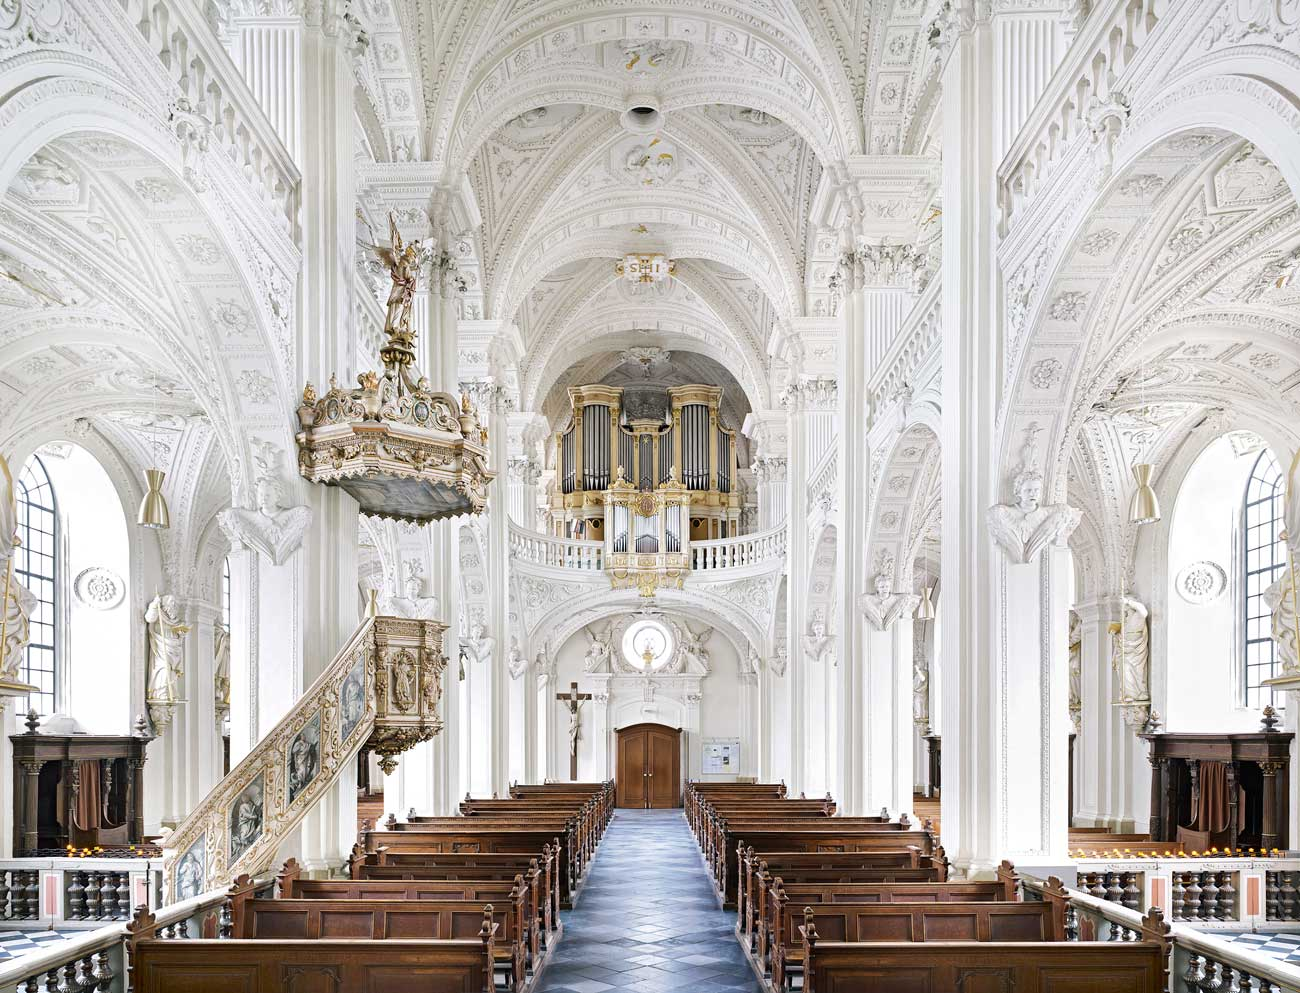 Candida-Hofer-Dominikanerkirche-Sankt-Andreas-Düsseldorf-II-2011